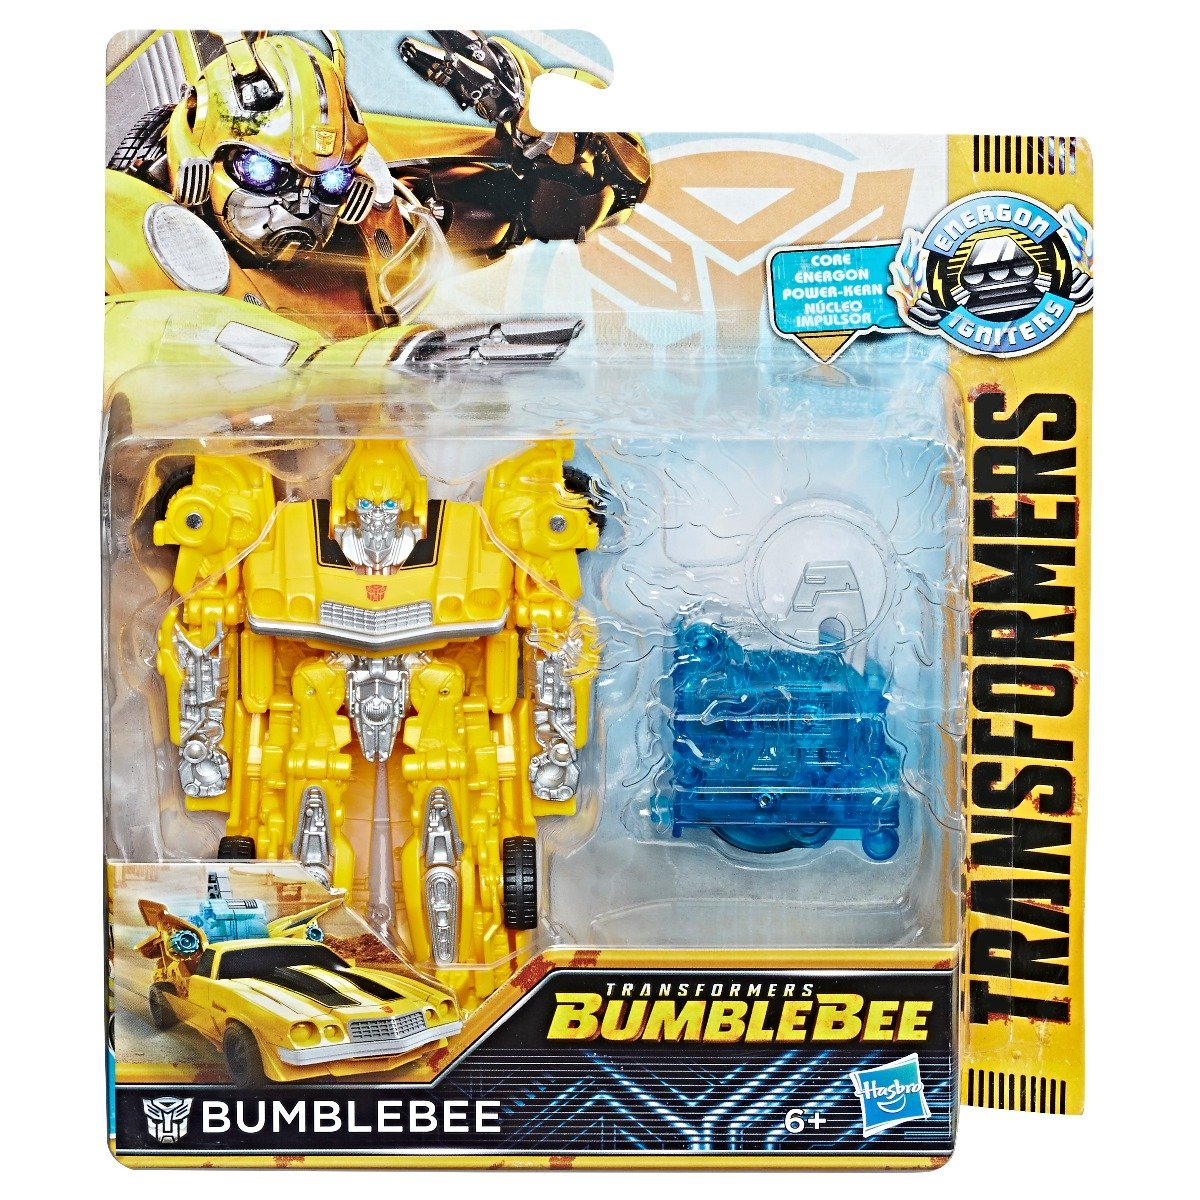 Figurina Transformers Energon Igniters Bumblebee Stryker 2